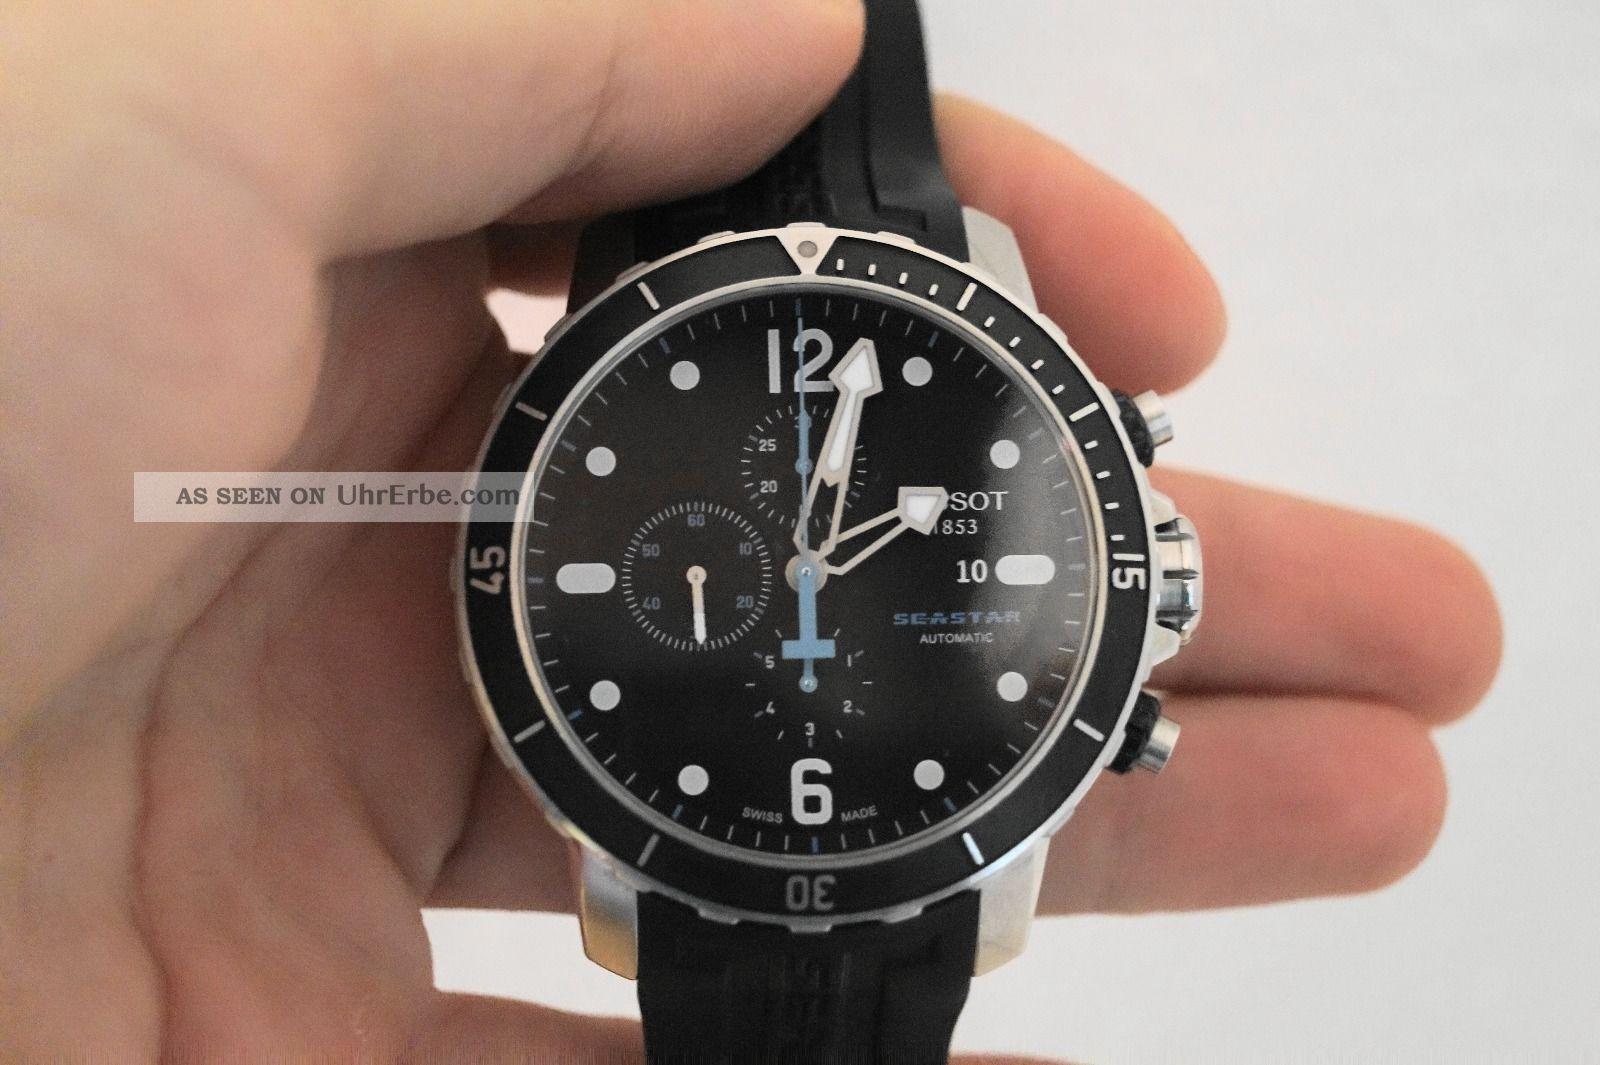 Tissot Seastar 1000 Automatic Chronograph Armbanduhren Bild